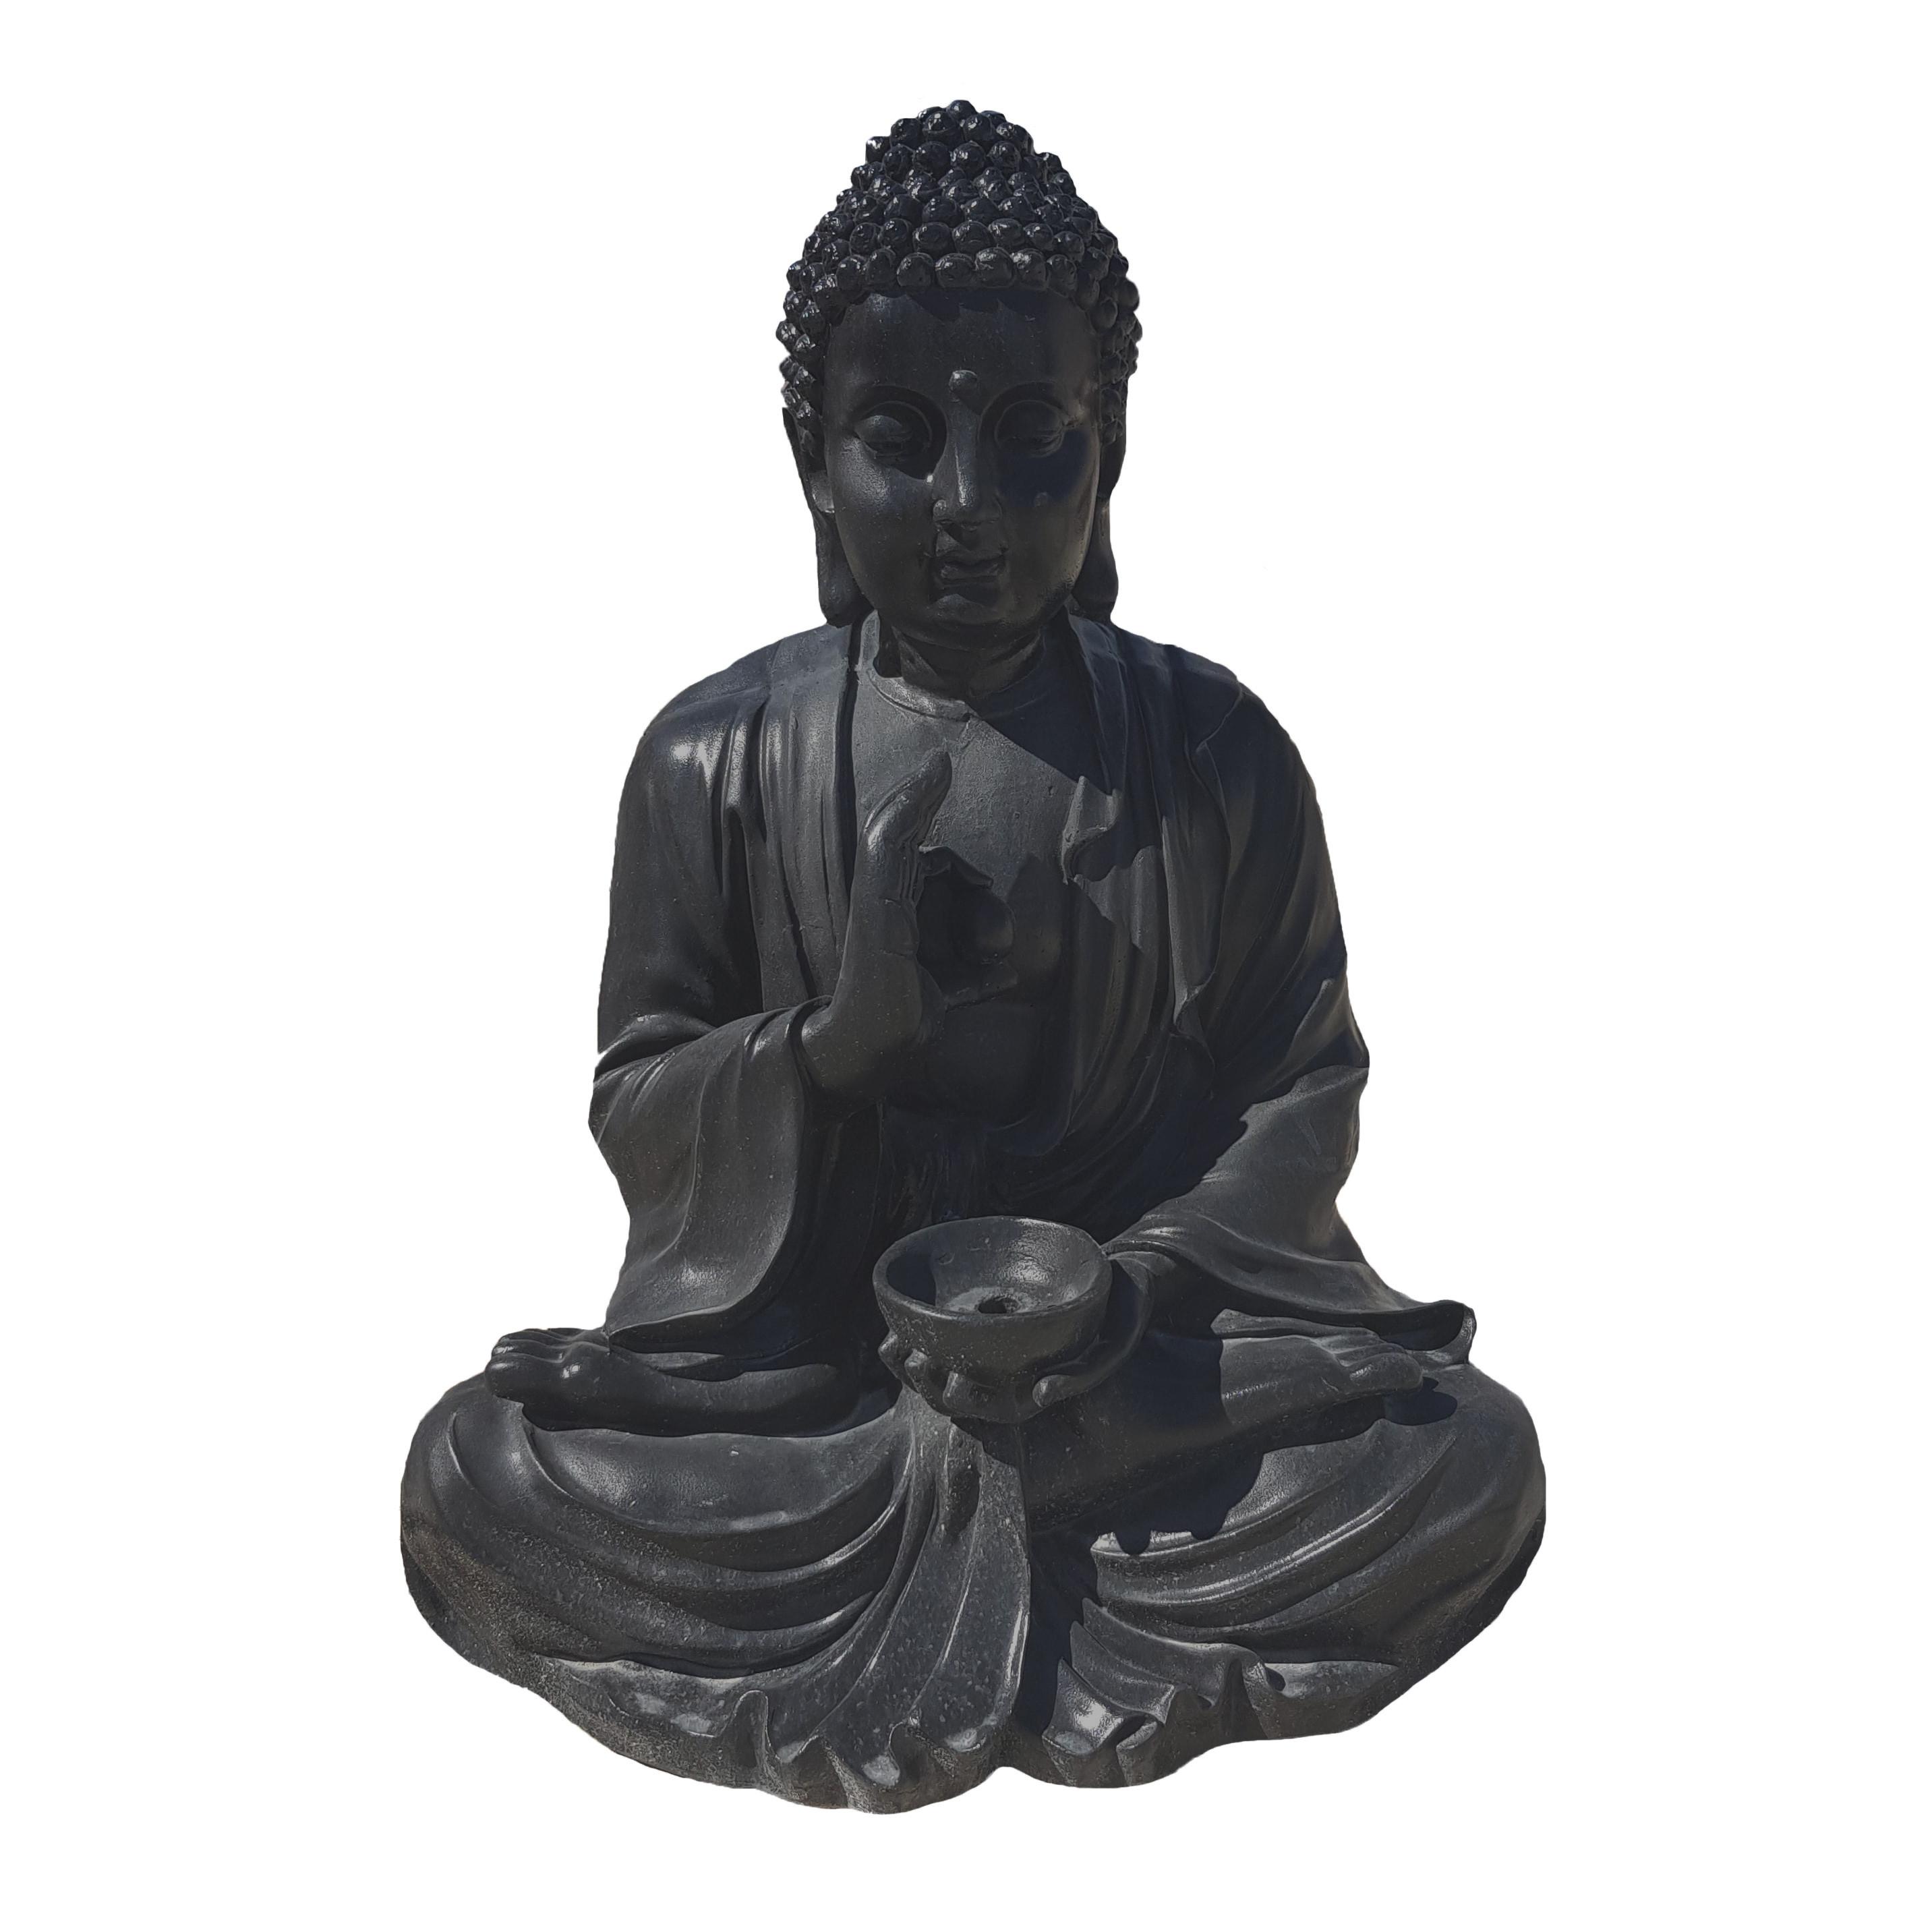 Fabricant Beton Cire France bouddha noir en béton ciré h85 cm | collic matériaux